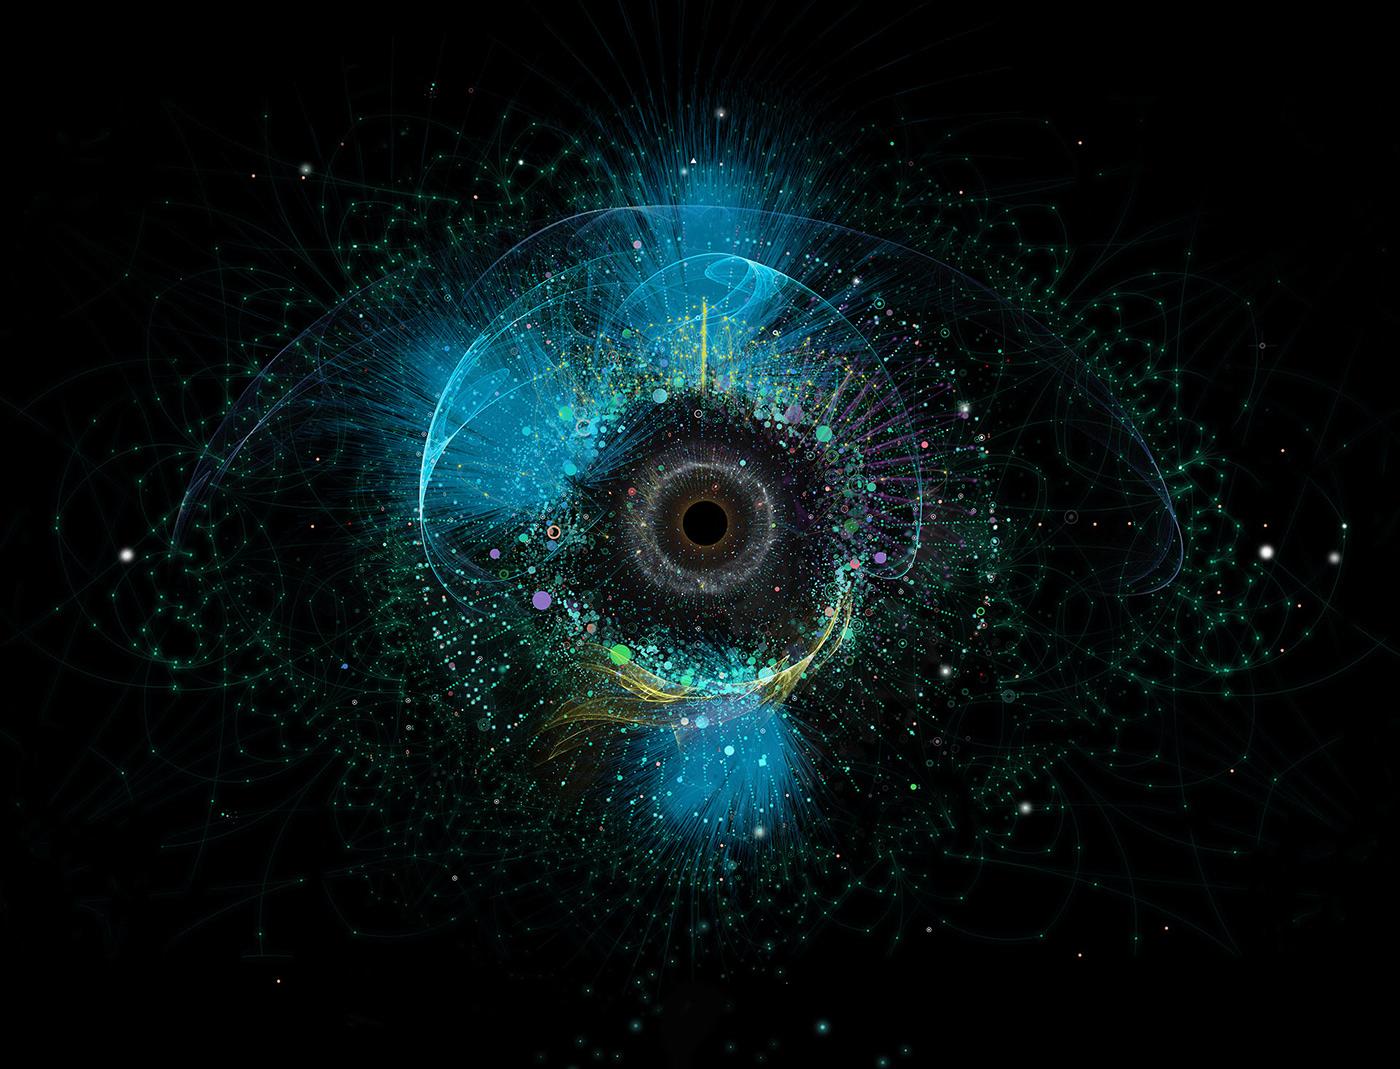 eye manifesto HPE universe see something black computing particle tech